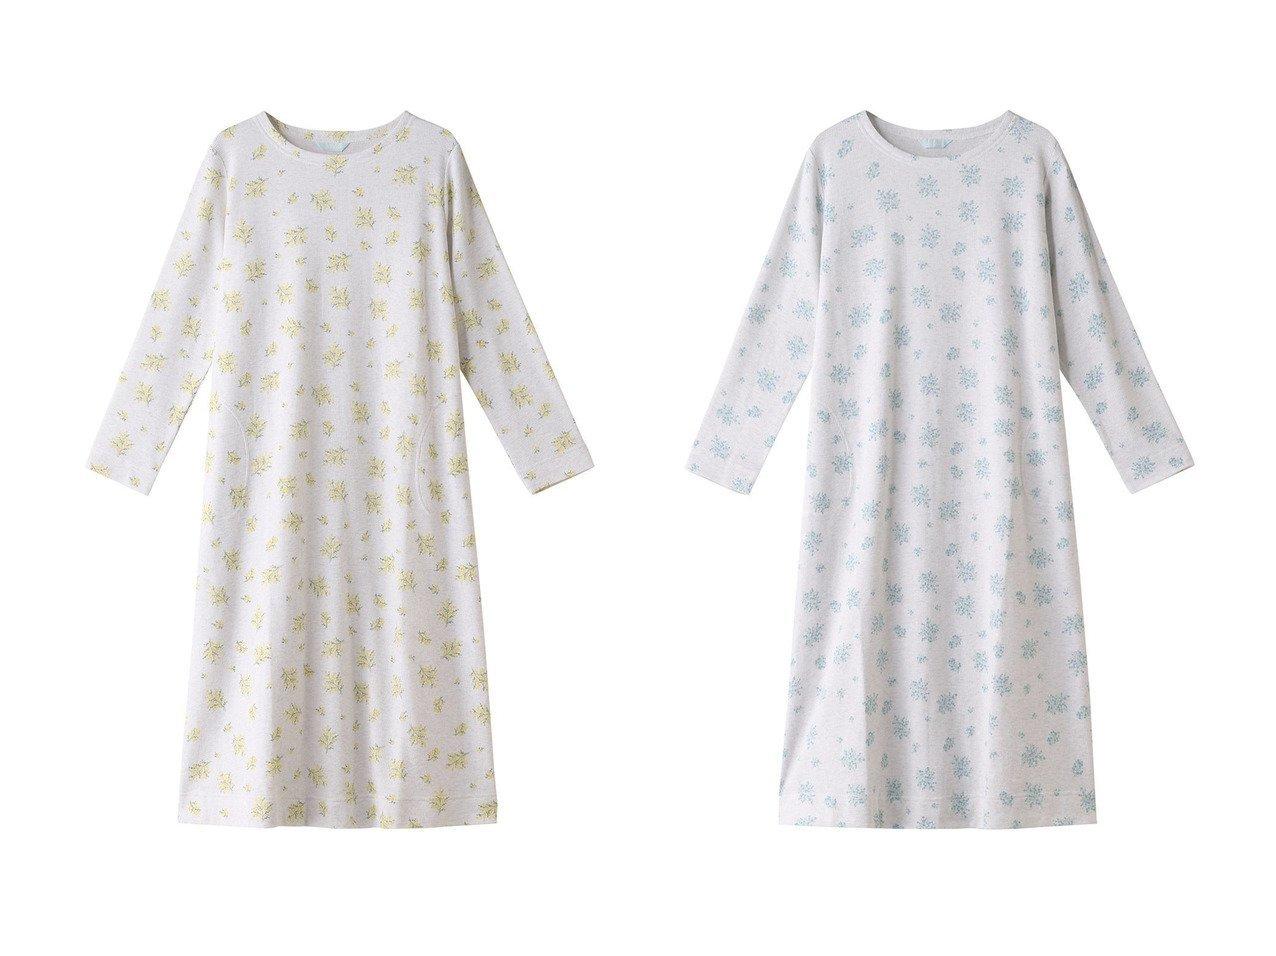 【KID BLUE/キッドブルー】のワッフルミモザPtワンピース ワンピース・ドレスのおすすめ!人気、トレンド・レディースファッションの通販  おすすめで人気の流行・トレンド、ファッションの通販商品 メンズファッション・キッズファッション・インテリア・家具・レディースファッション・服の通販 founy(ファニー) https://founy.com/ ファッション Fashion レディースファッション WOMEN ワンピース Dress 2021年 2021 2021 春夏 S/S SS Spring/Summer 2021 S/S 春夏 SS Spring/Summer おすすめ Recommend セットアップ フェミニン プリント リラックス ワッフル 春 Spring |ID:crp329100000025117